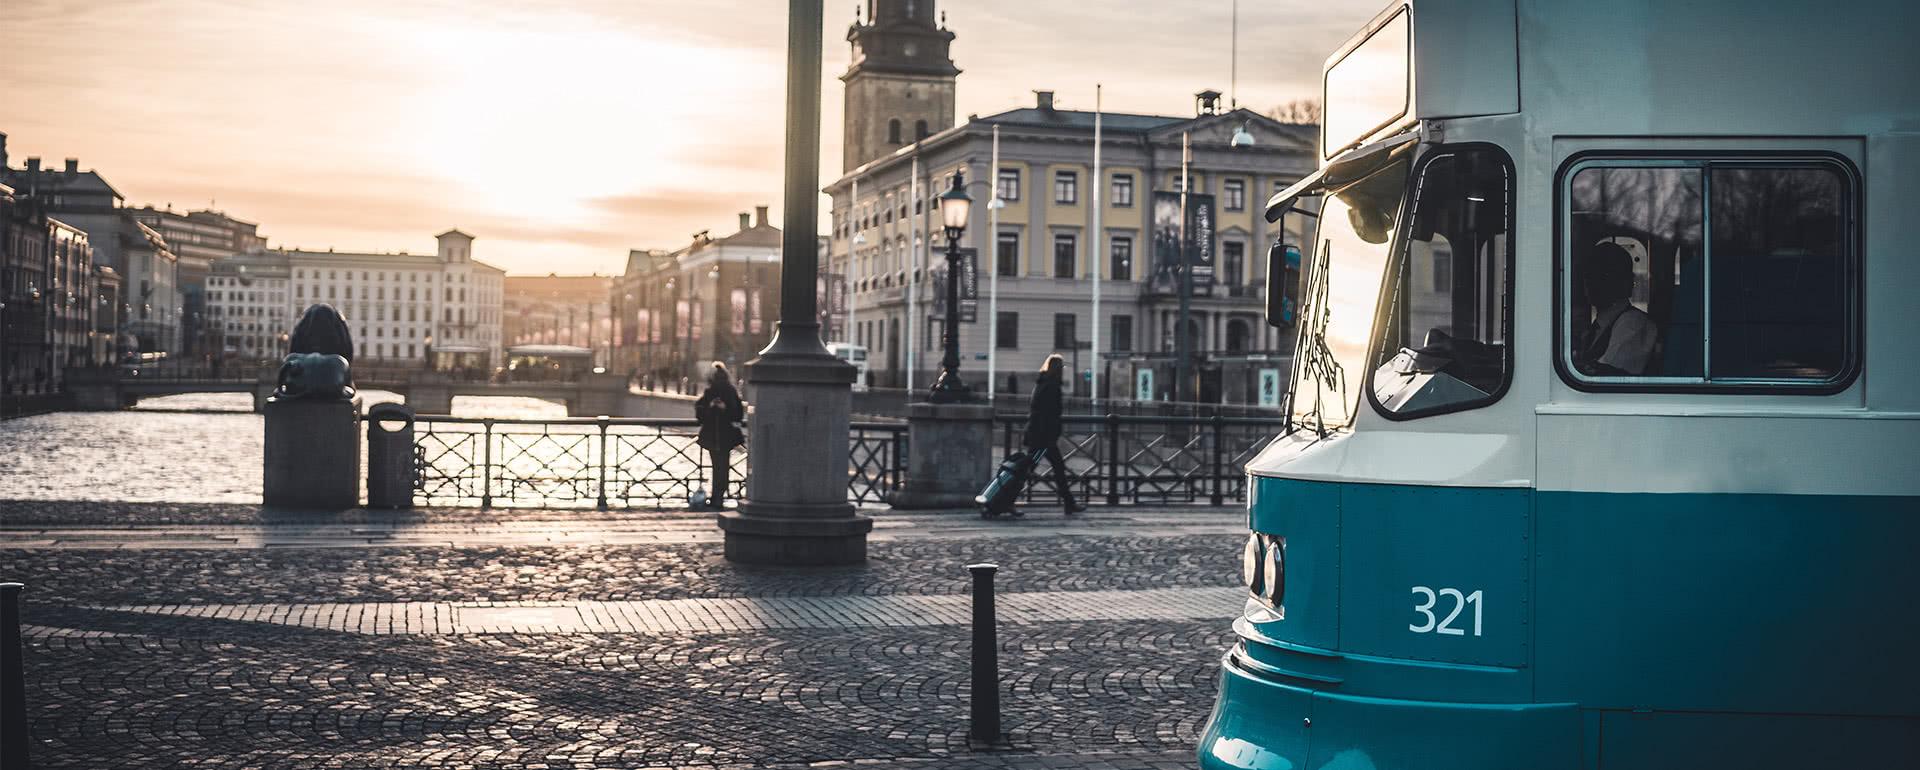 Titelbild von Göteborg